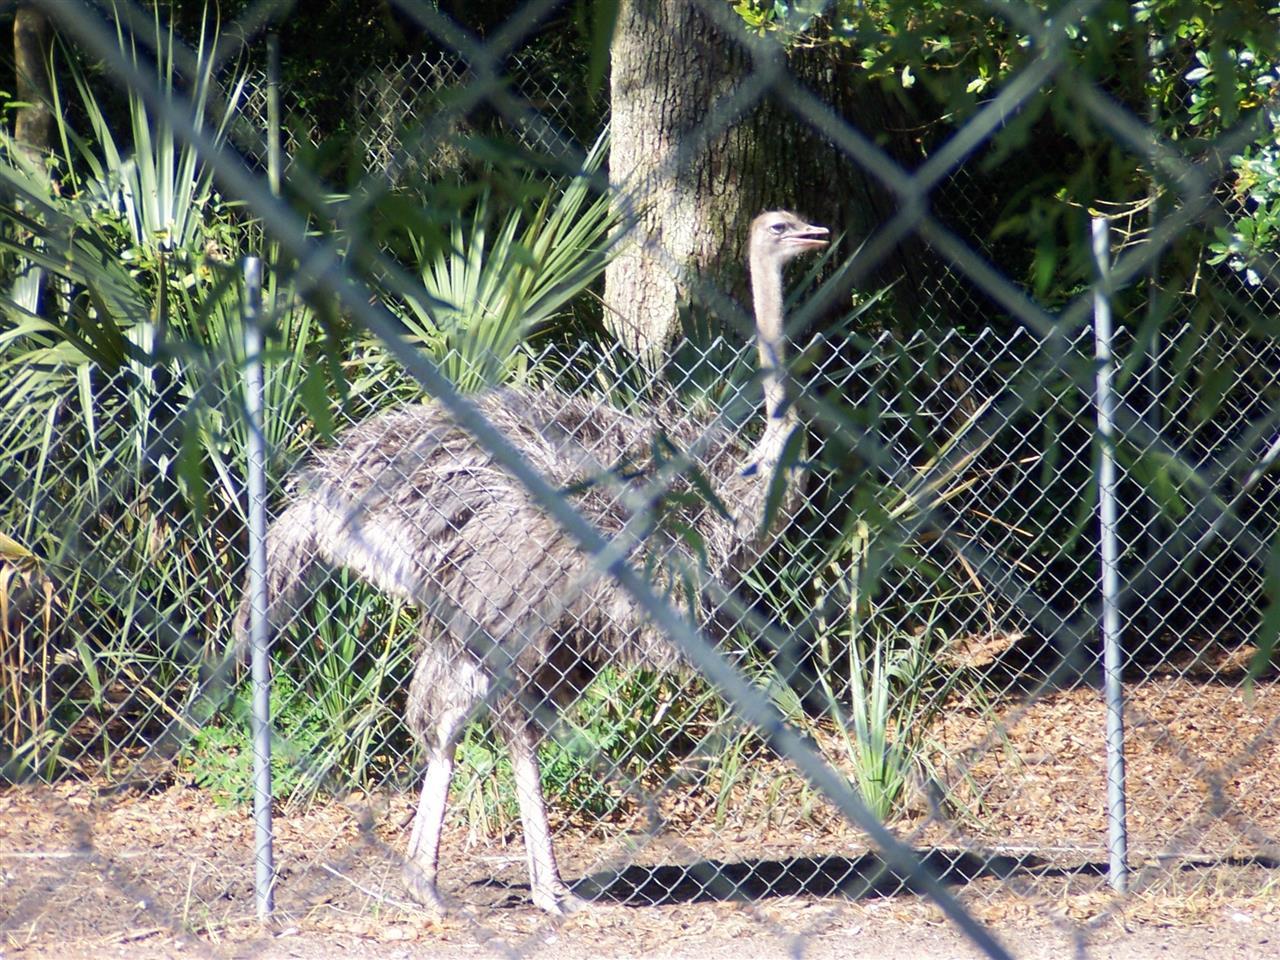 Shot from Beaks Bird Sanctuary off Heckscher Drive in Jacksonville, Florida